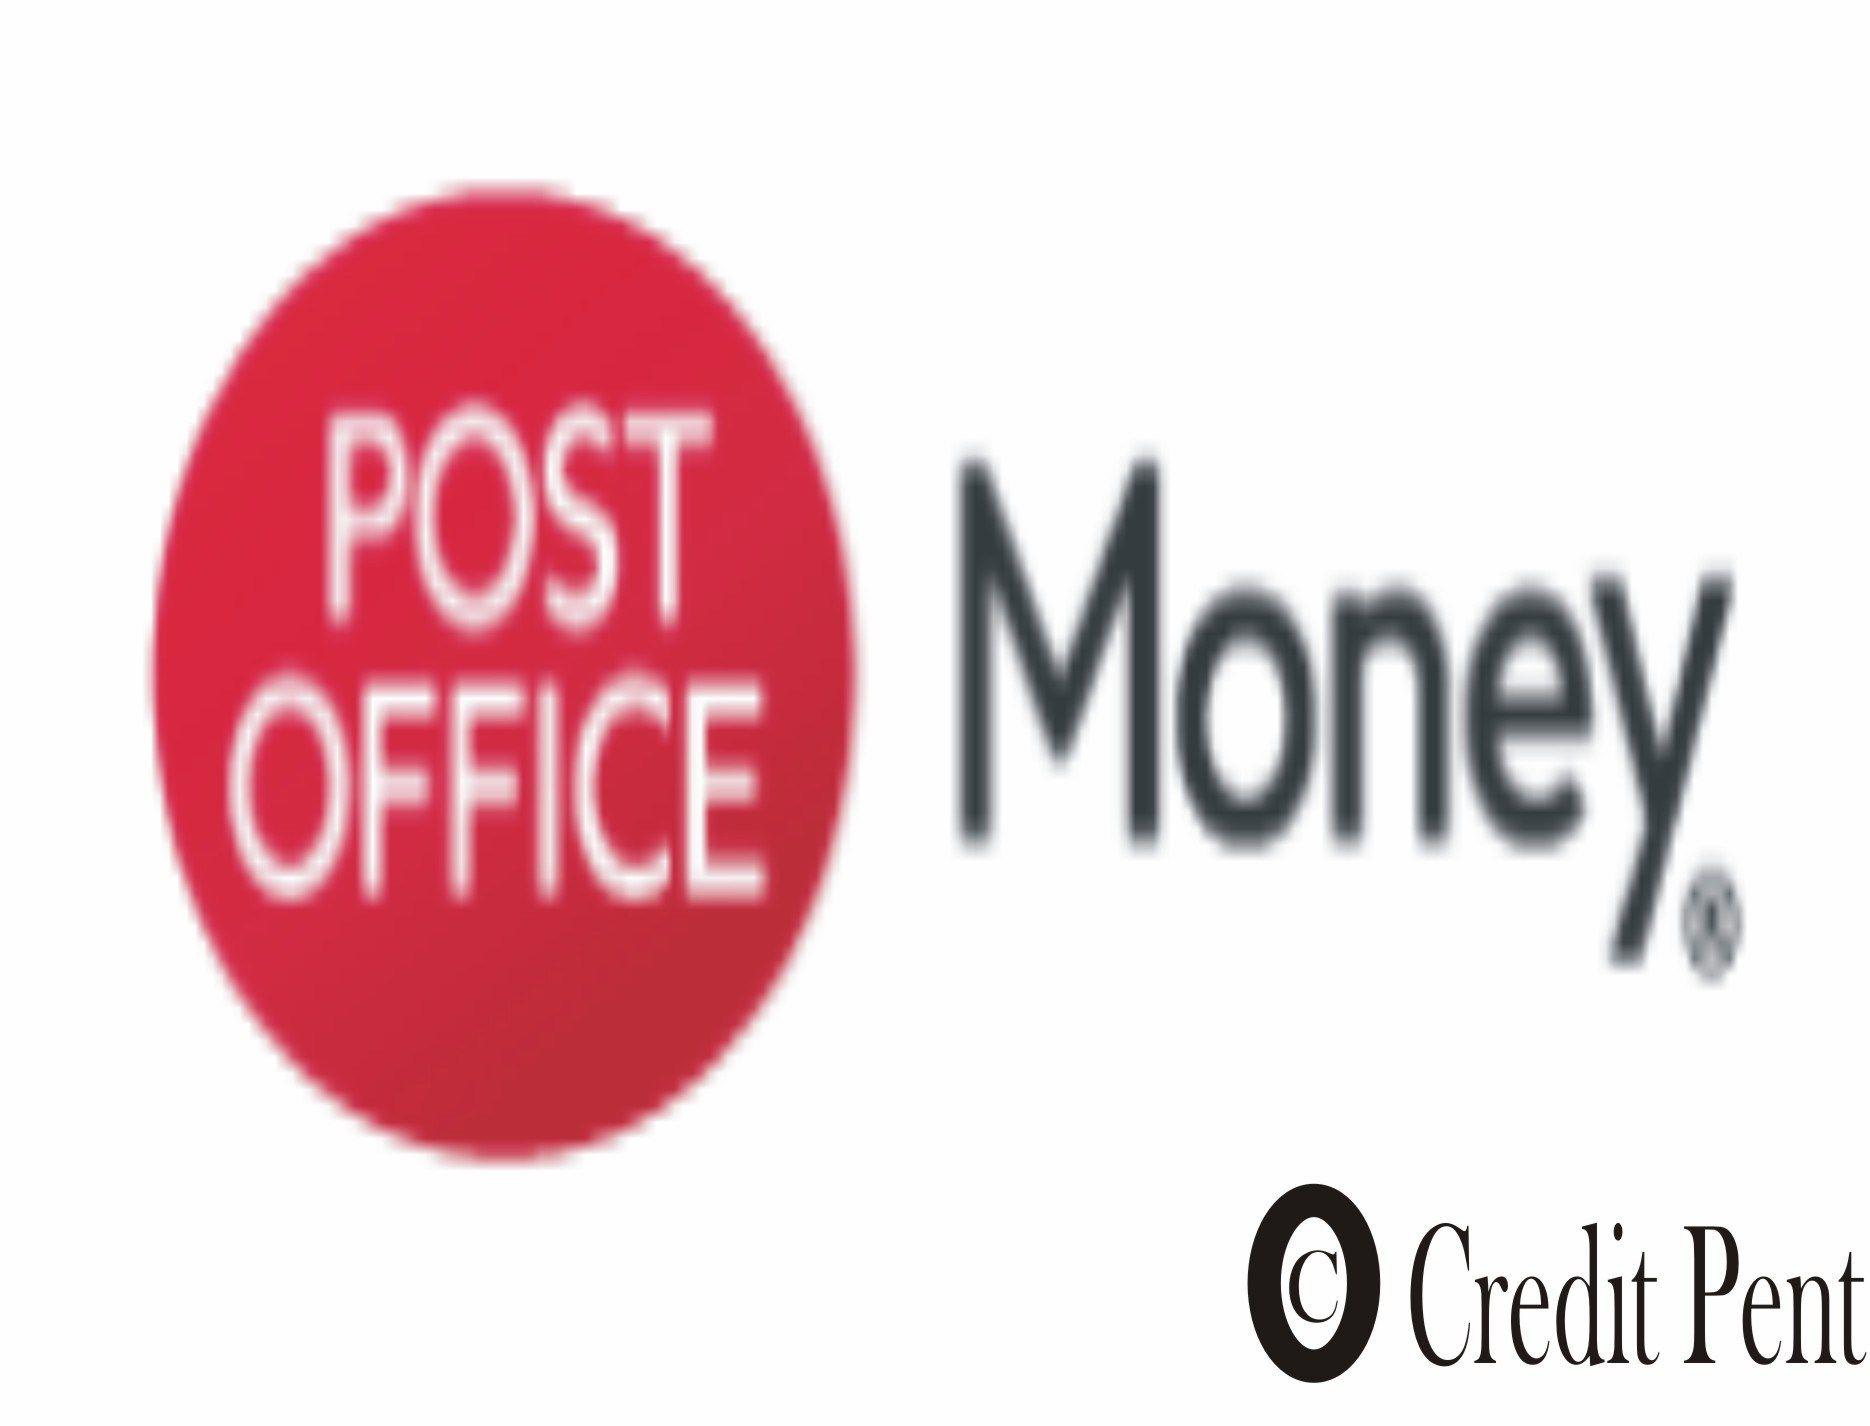 Post Office Money Credit Card Login Post Office Online Banking Online Banking Credit Card Post Office